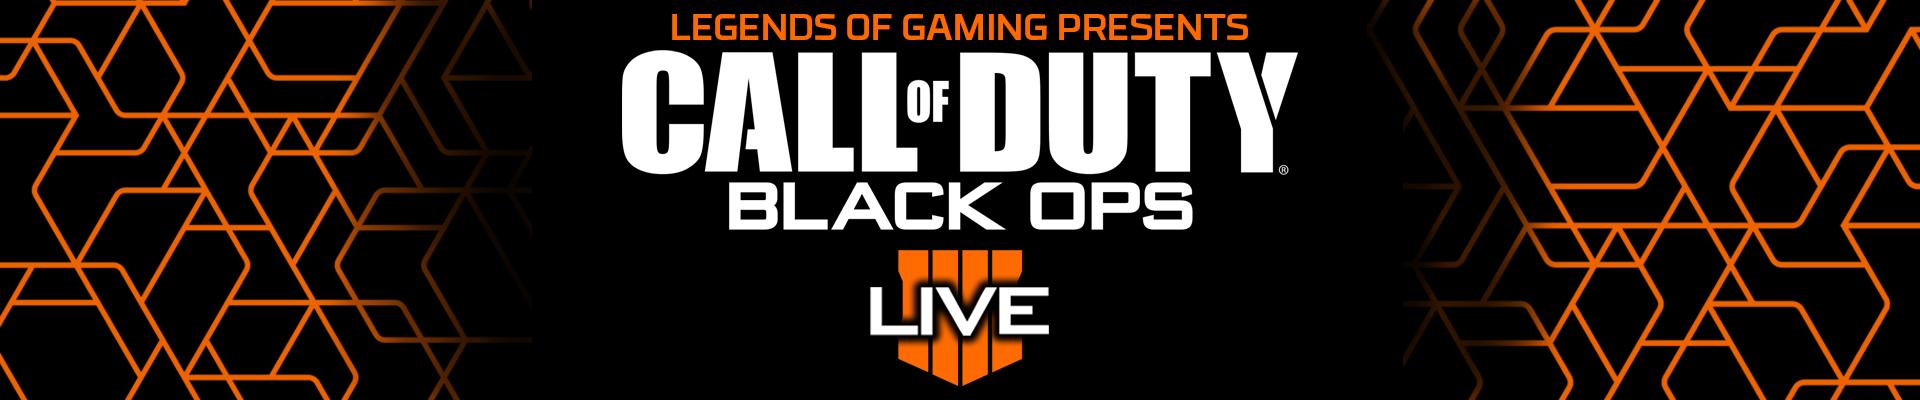 Legends of Gaming presents: Black Ops 4 LIVE